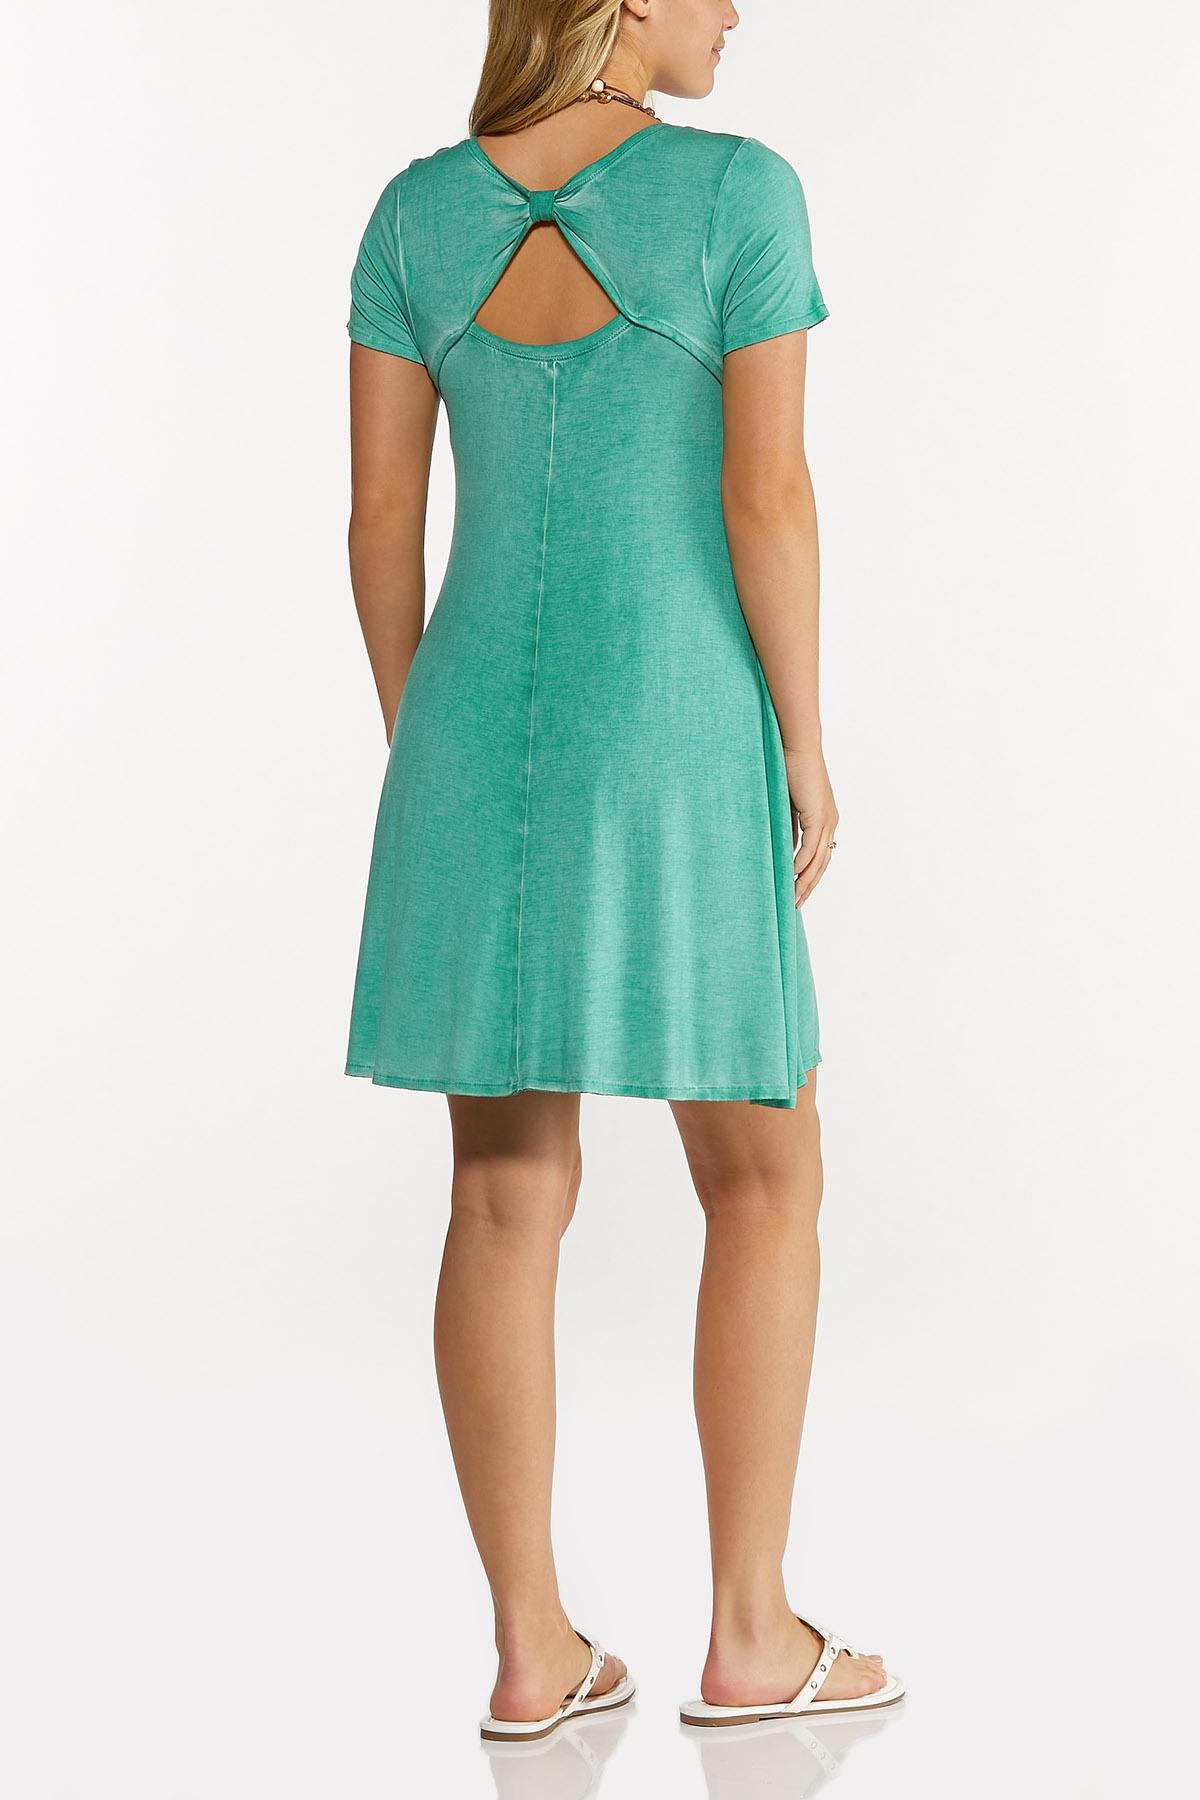 Dyed Shirt Swing Dress (Item #44635268)